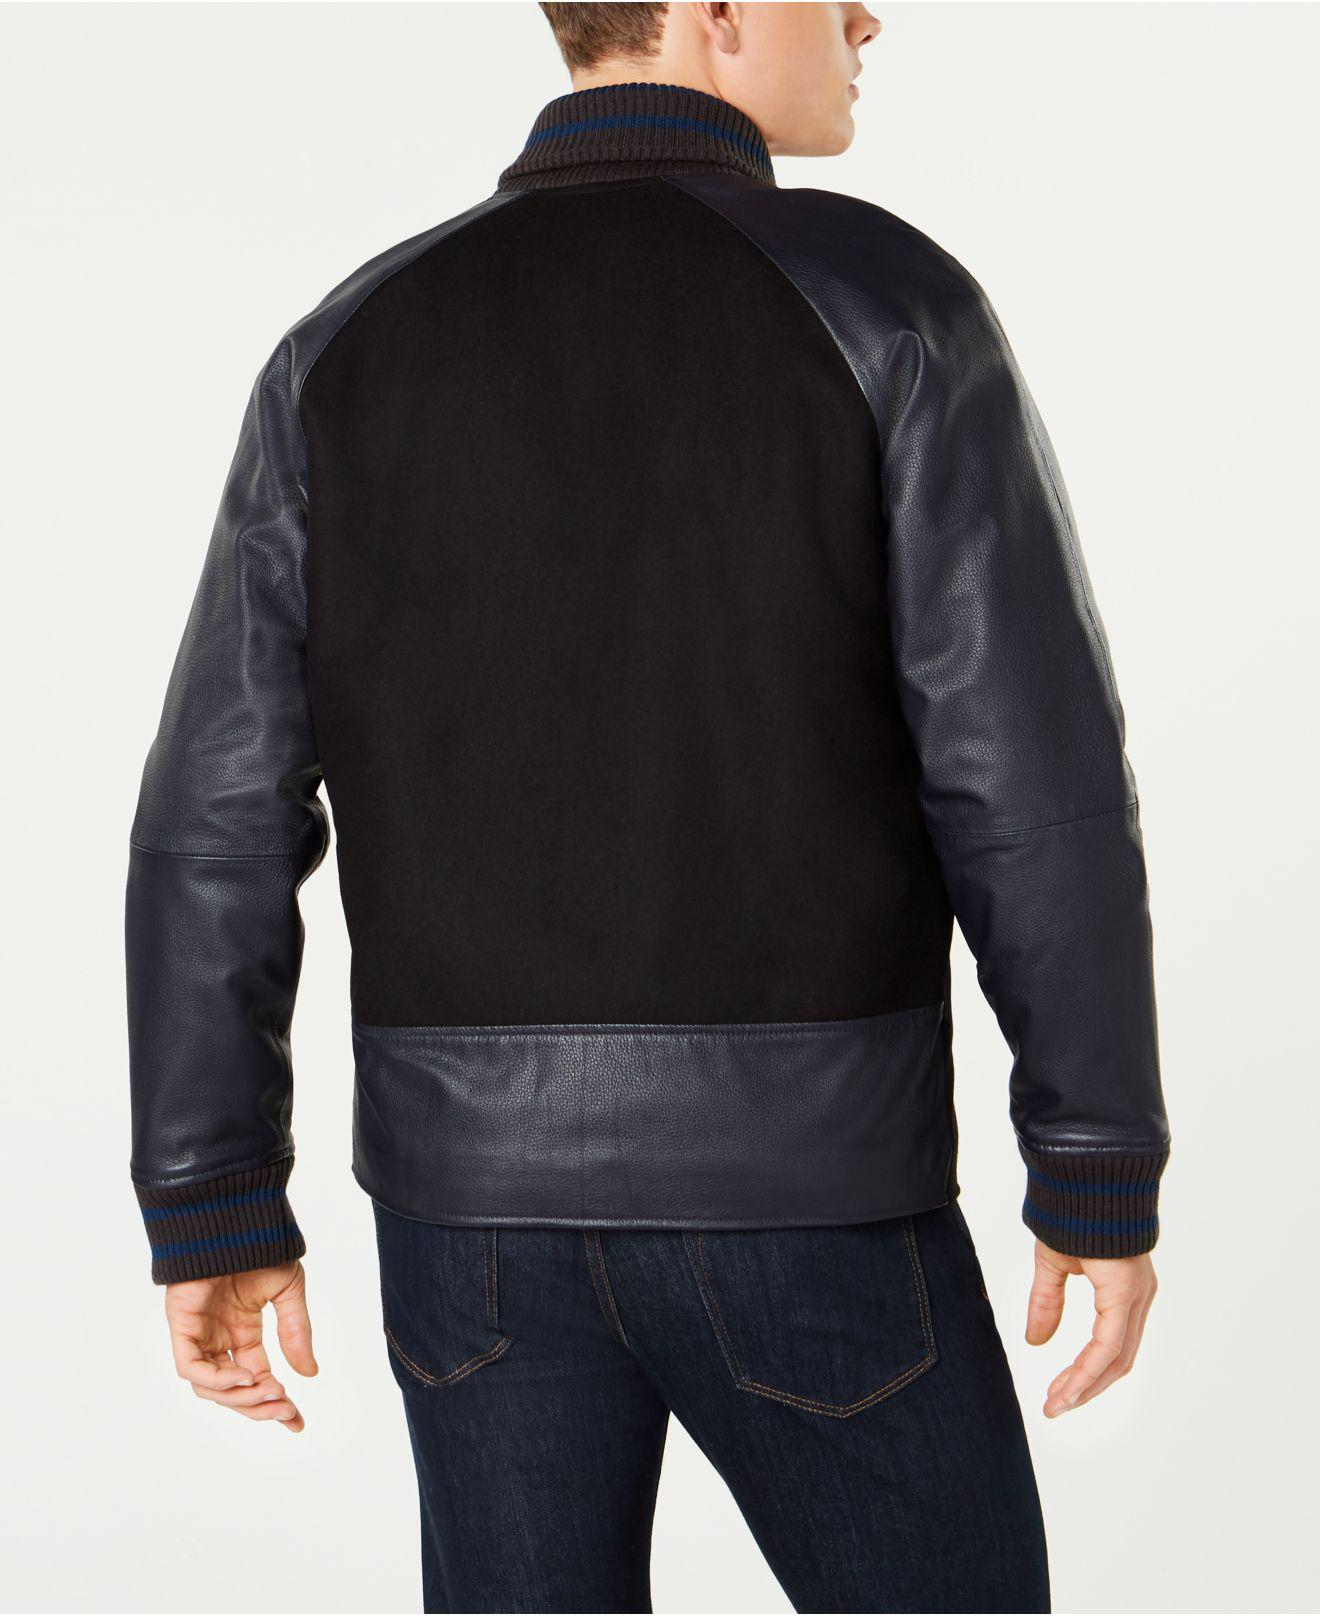 Klein Lyst Jacket Black For Mixed Media Men Varsity Calvin In 55xr4fnq